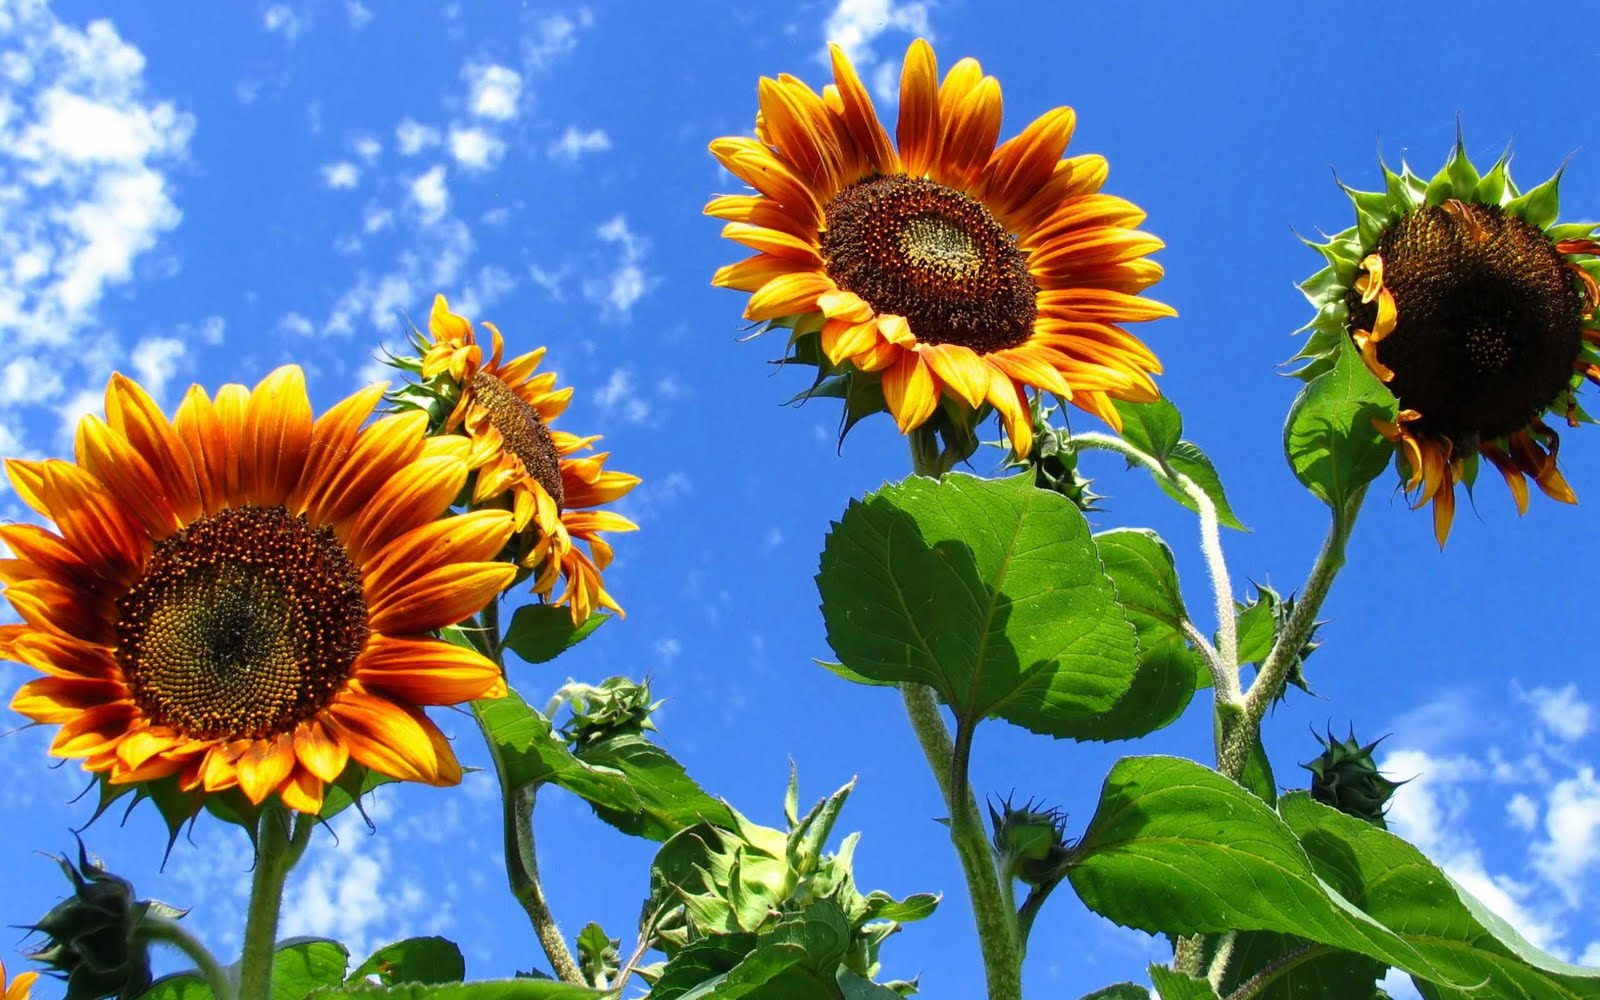 http://1.bp.blogspot.com/-xIkAesKxBLA/TkY6hunS5II/AAAAAAAAD0I/S7uVZX1qf-4/s1600/sunflower_wallpaper_2064.jpg